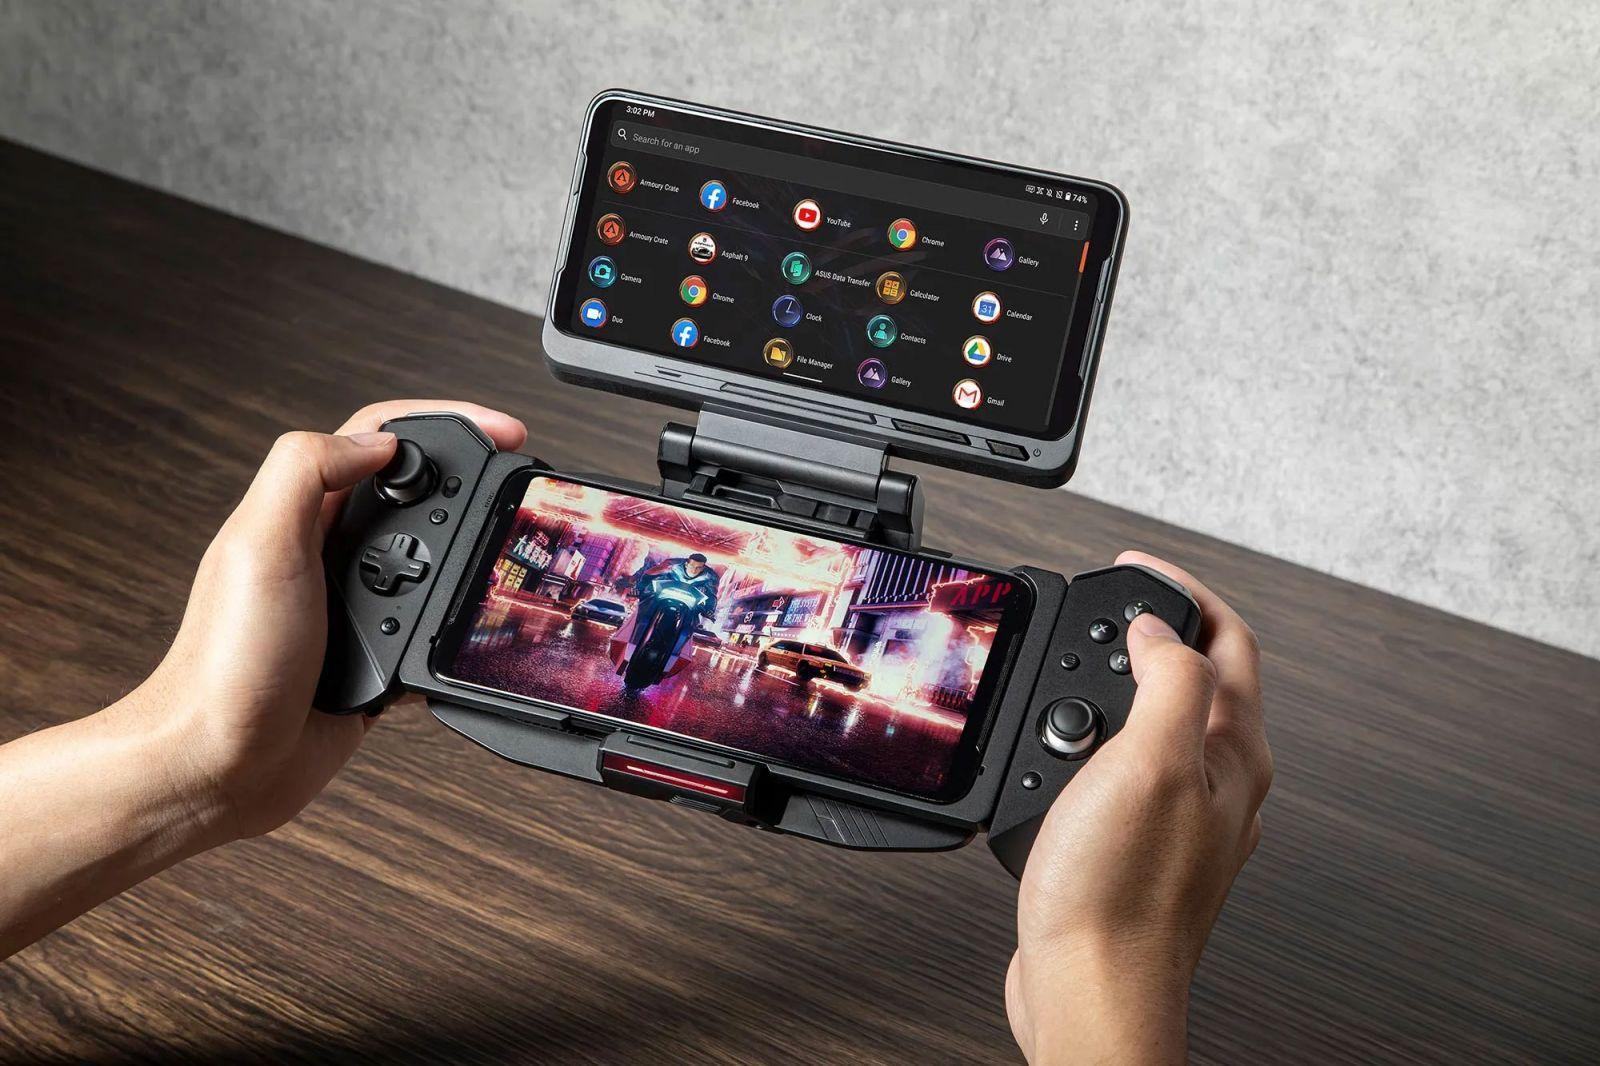 Asus представила игровой смартфон Asus ROG Phone 3 (11)